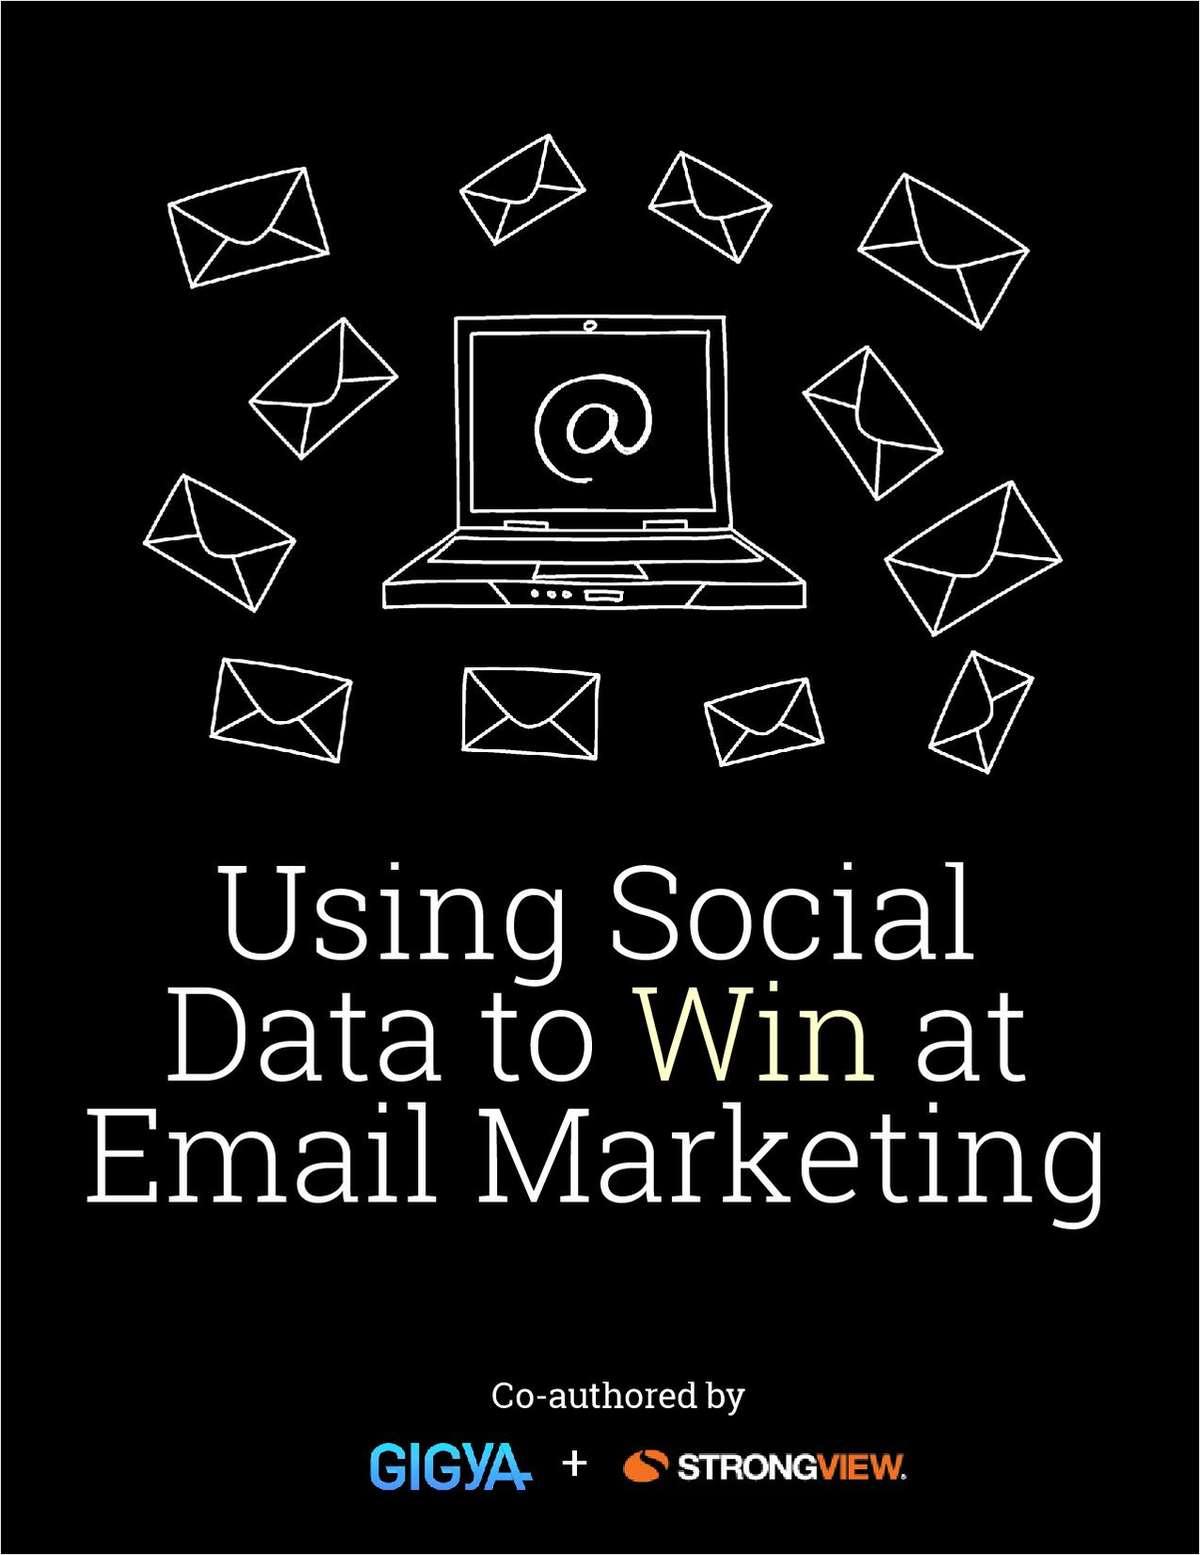 Using social data to win at email marketing